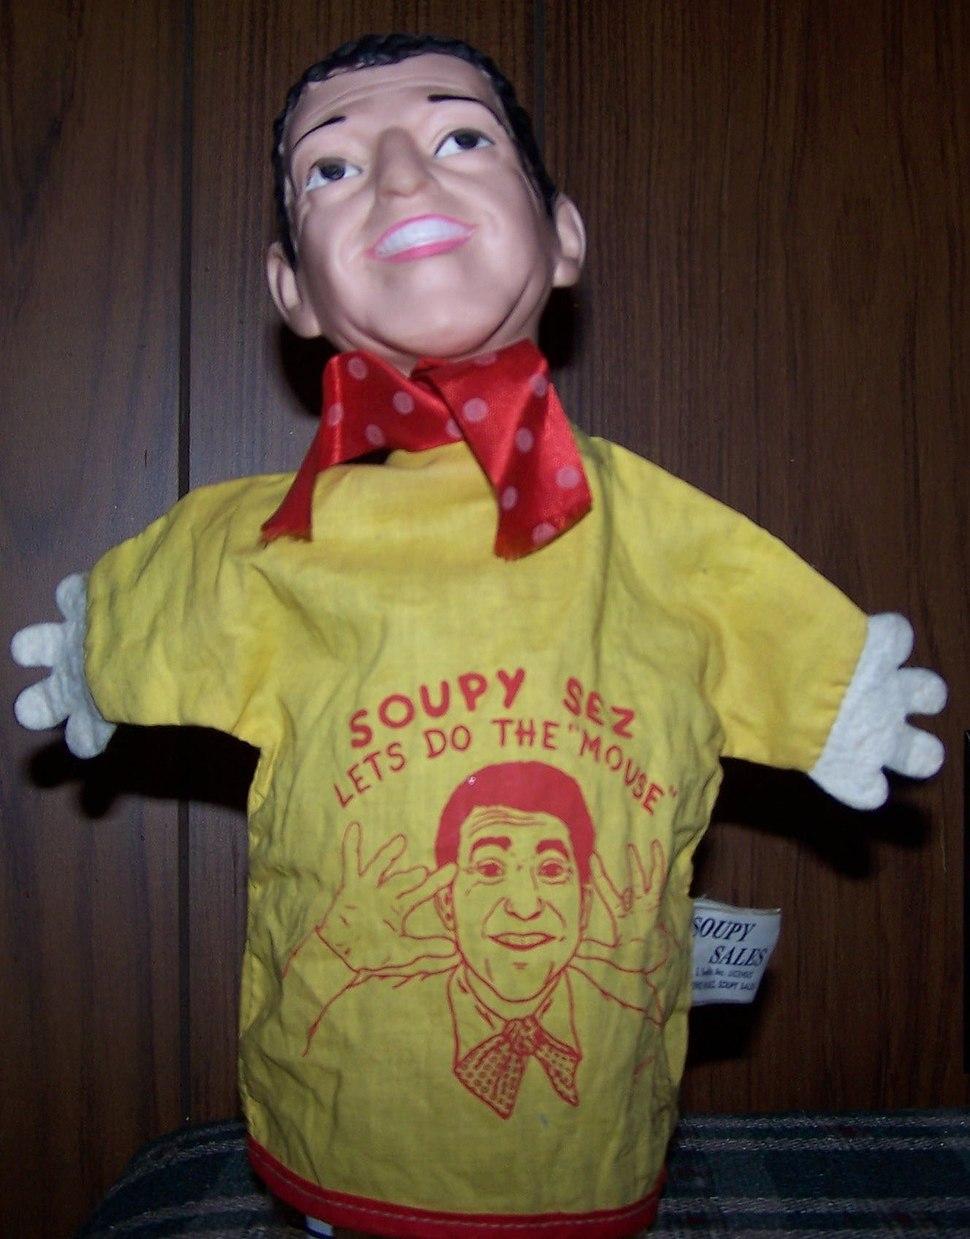 Soupy puppet